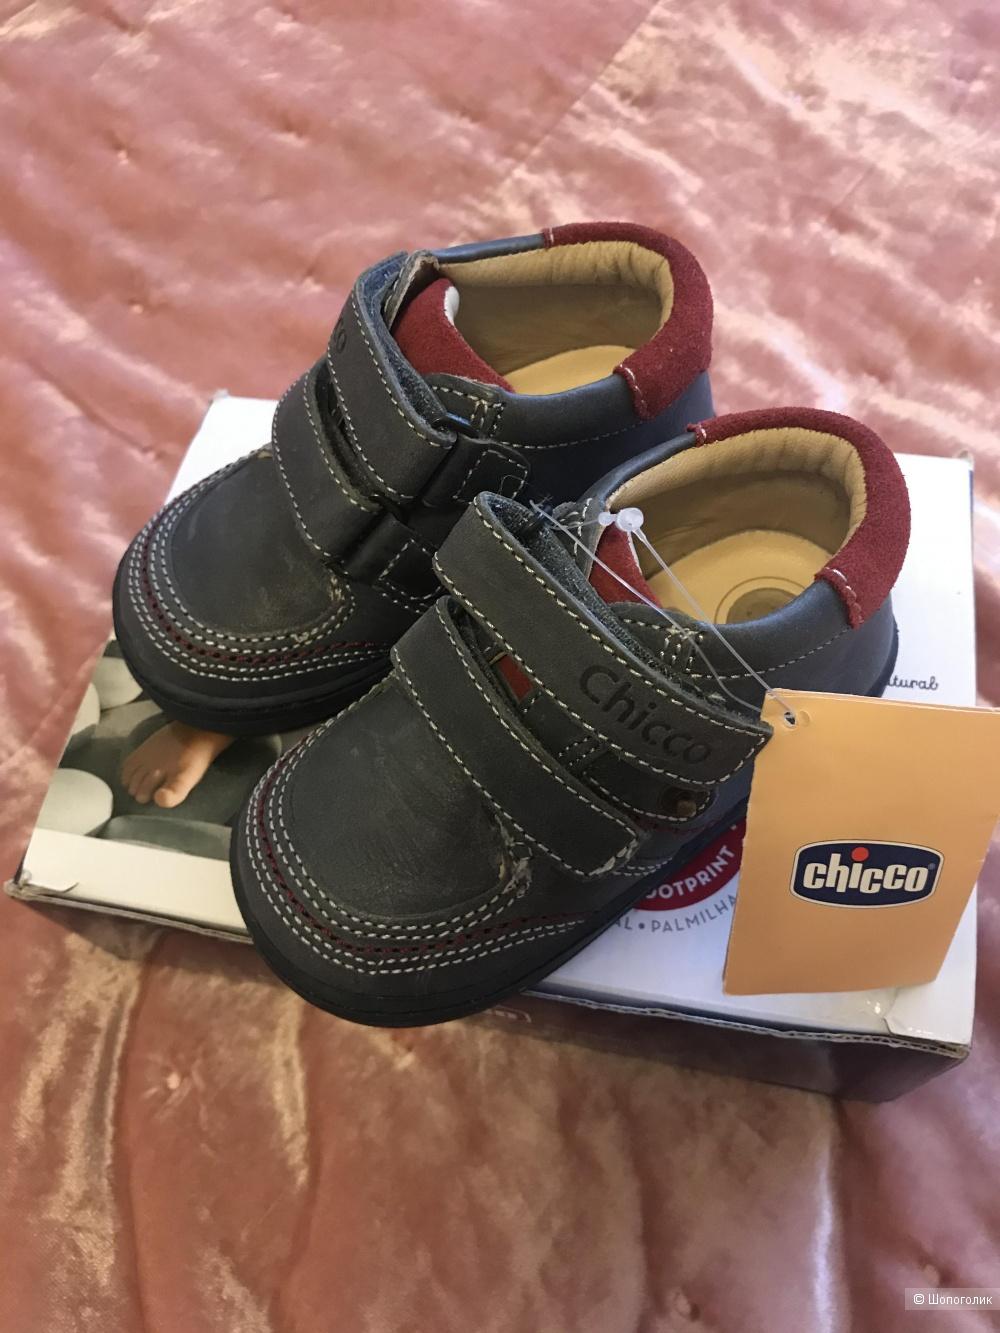 Ботиночки кроссовки Chicco 21 размер